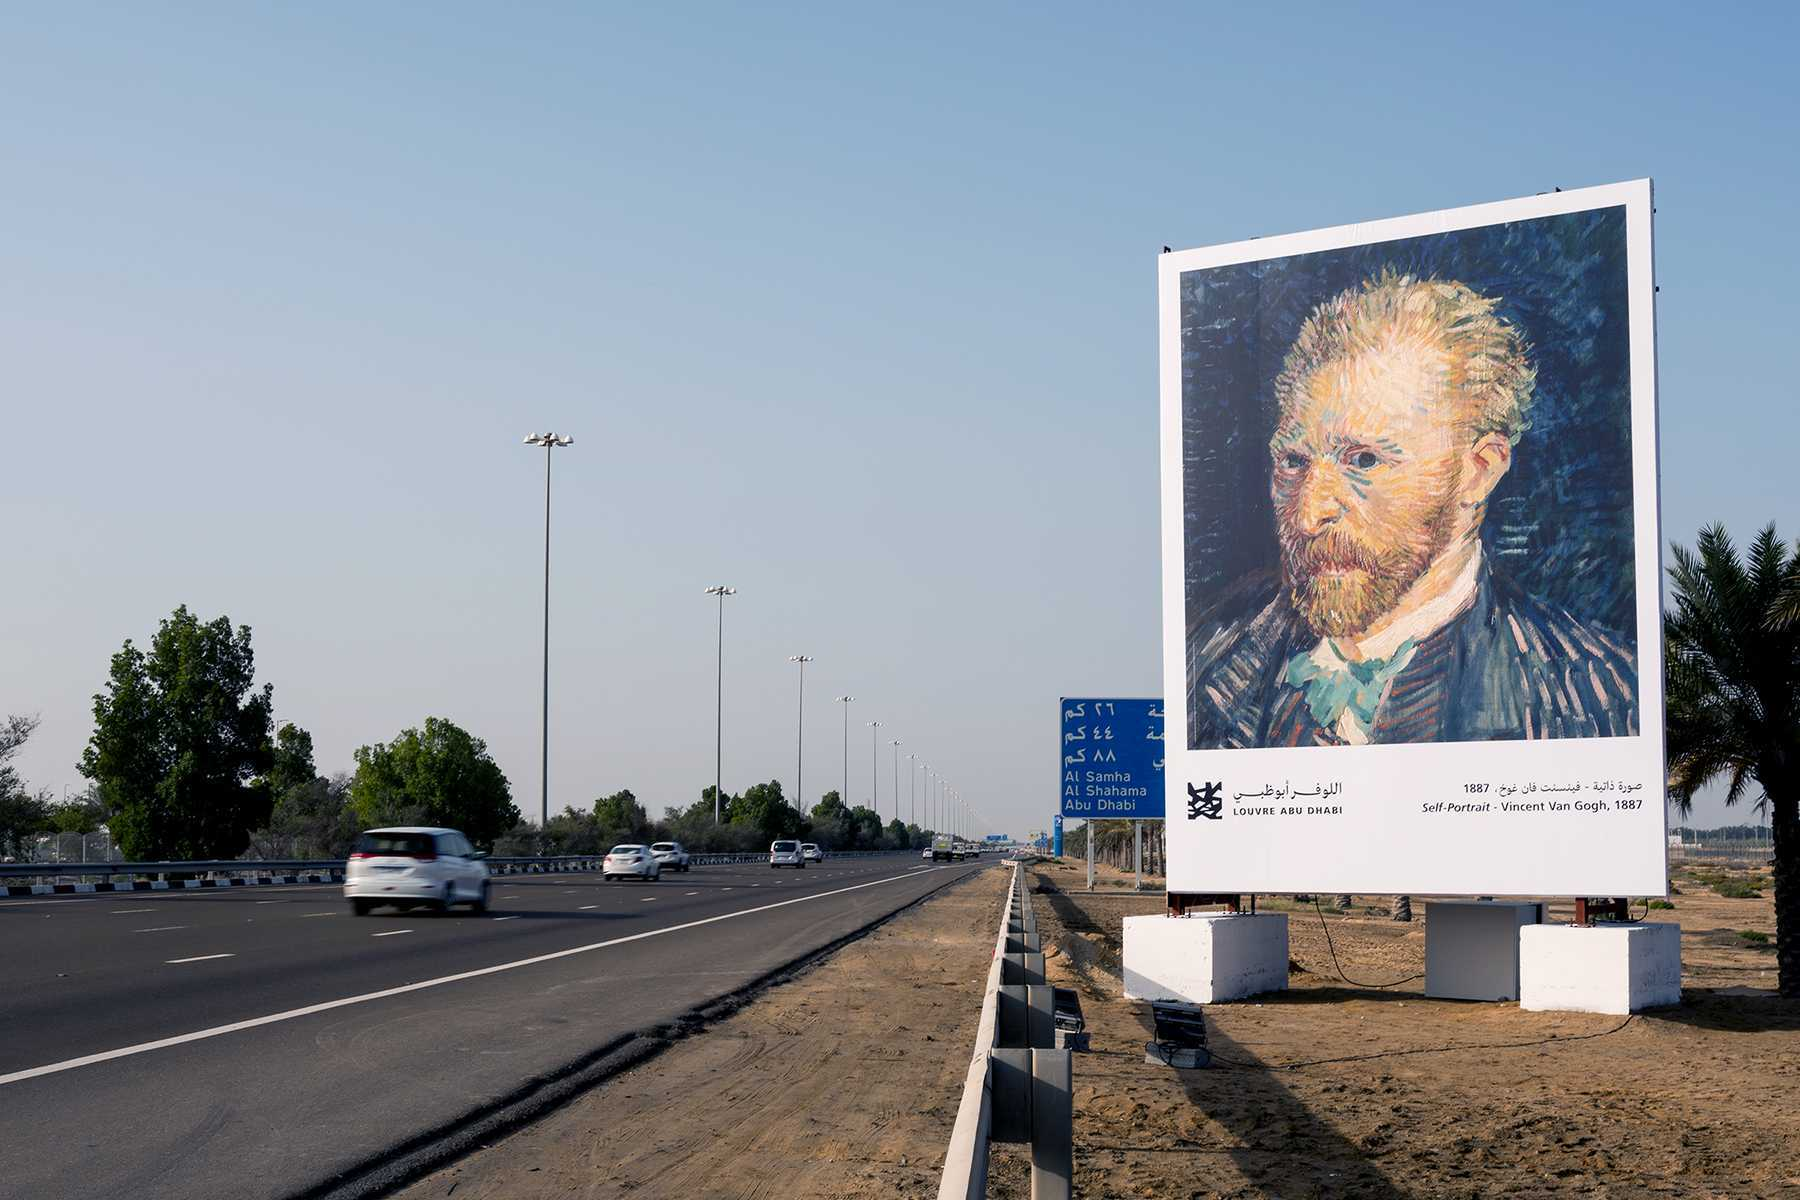 Louvre Abu Dhabi Highway Gallery